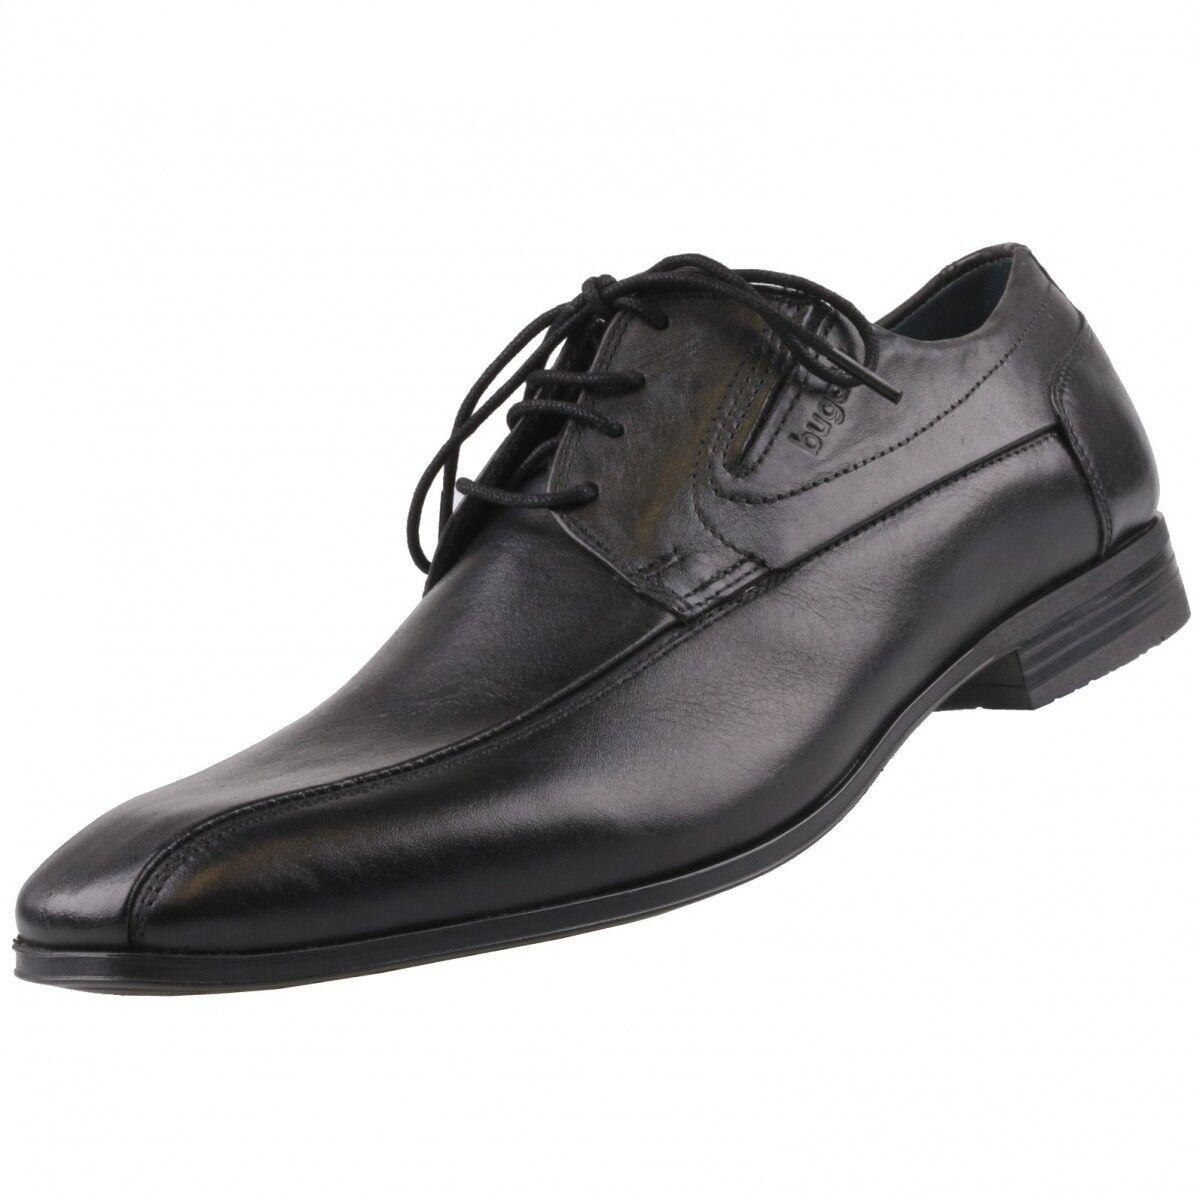 NEU Bugatti Halbschuhe Schuhe Herrenschuhe Business-Schuhe U1802-1 Schwarz